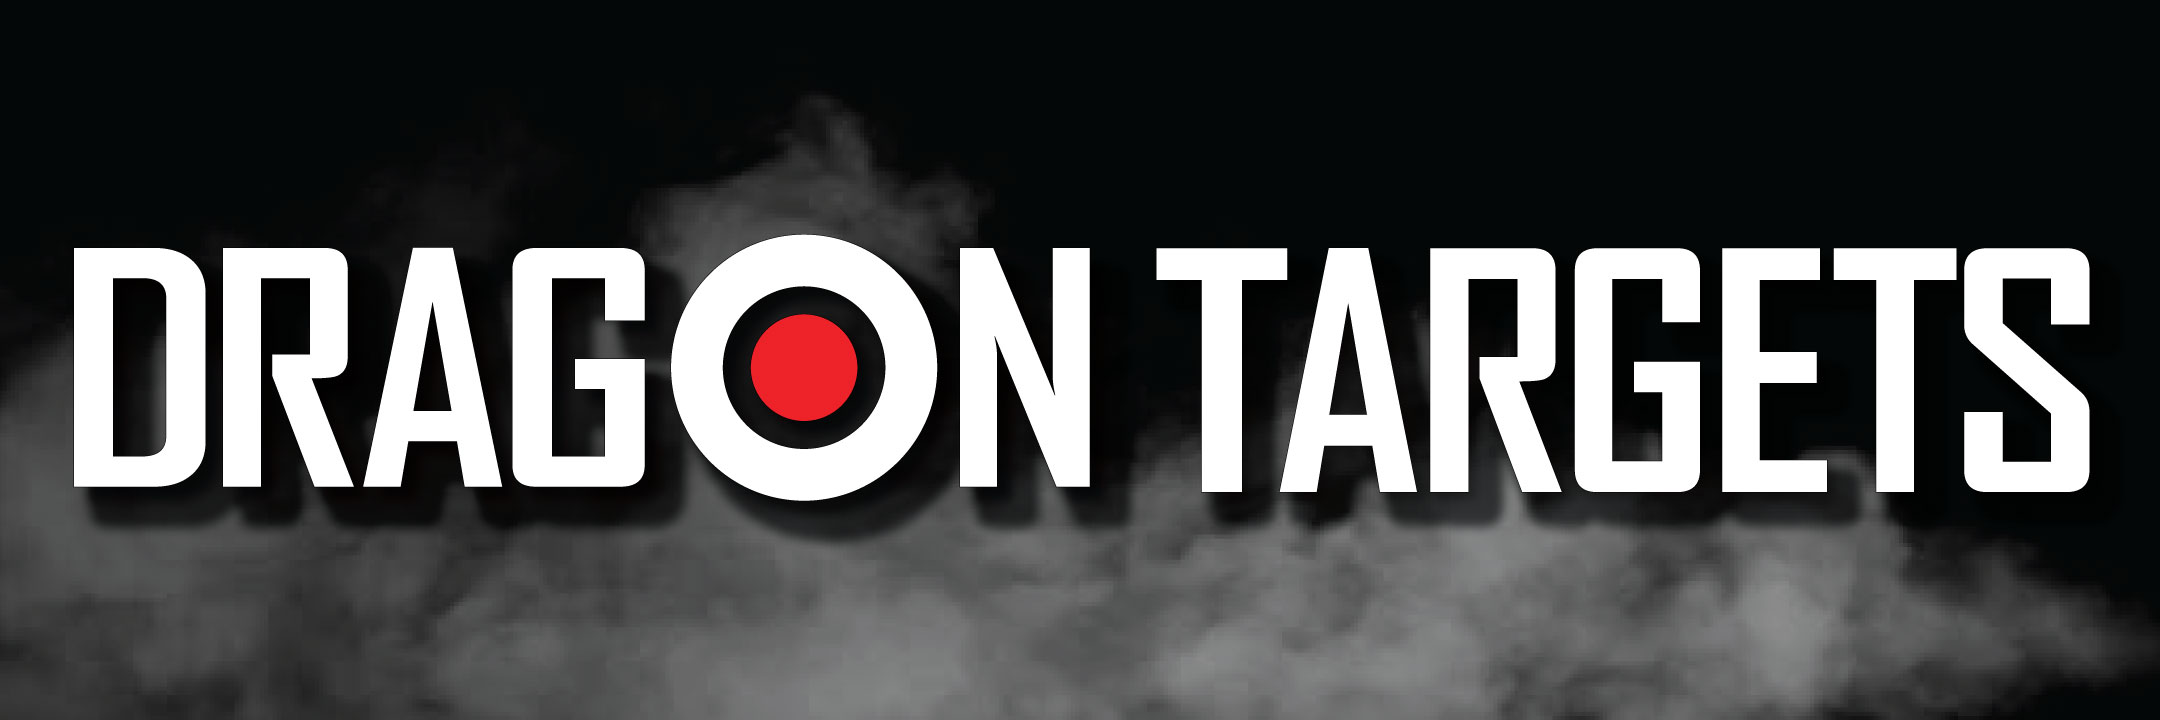 dragon-targets-banner.jpg